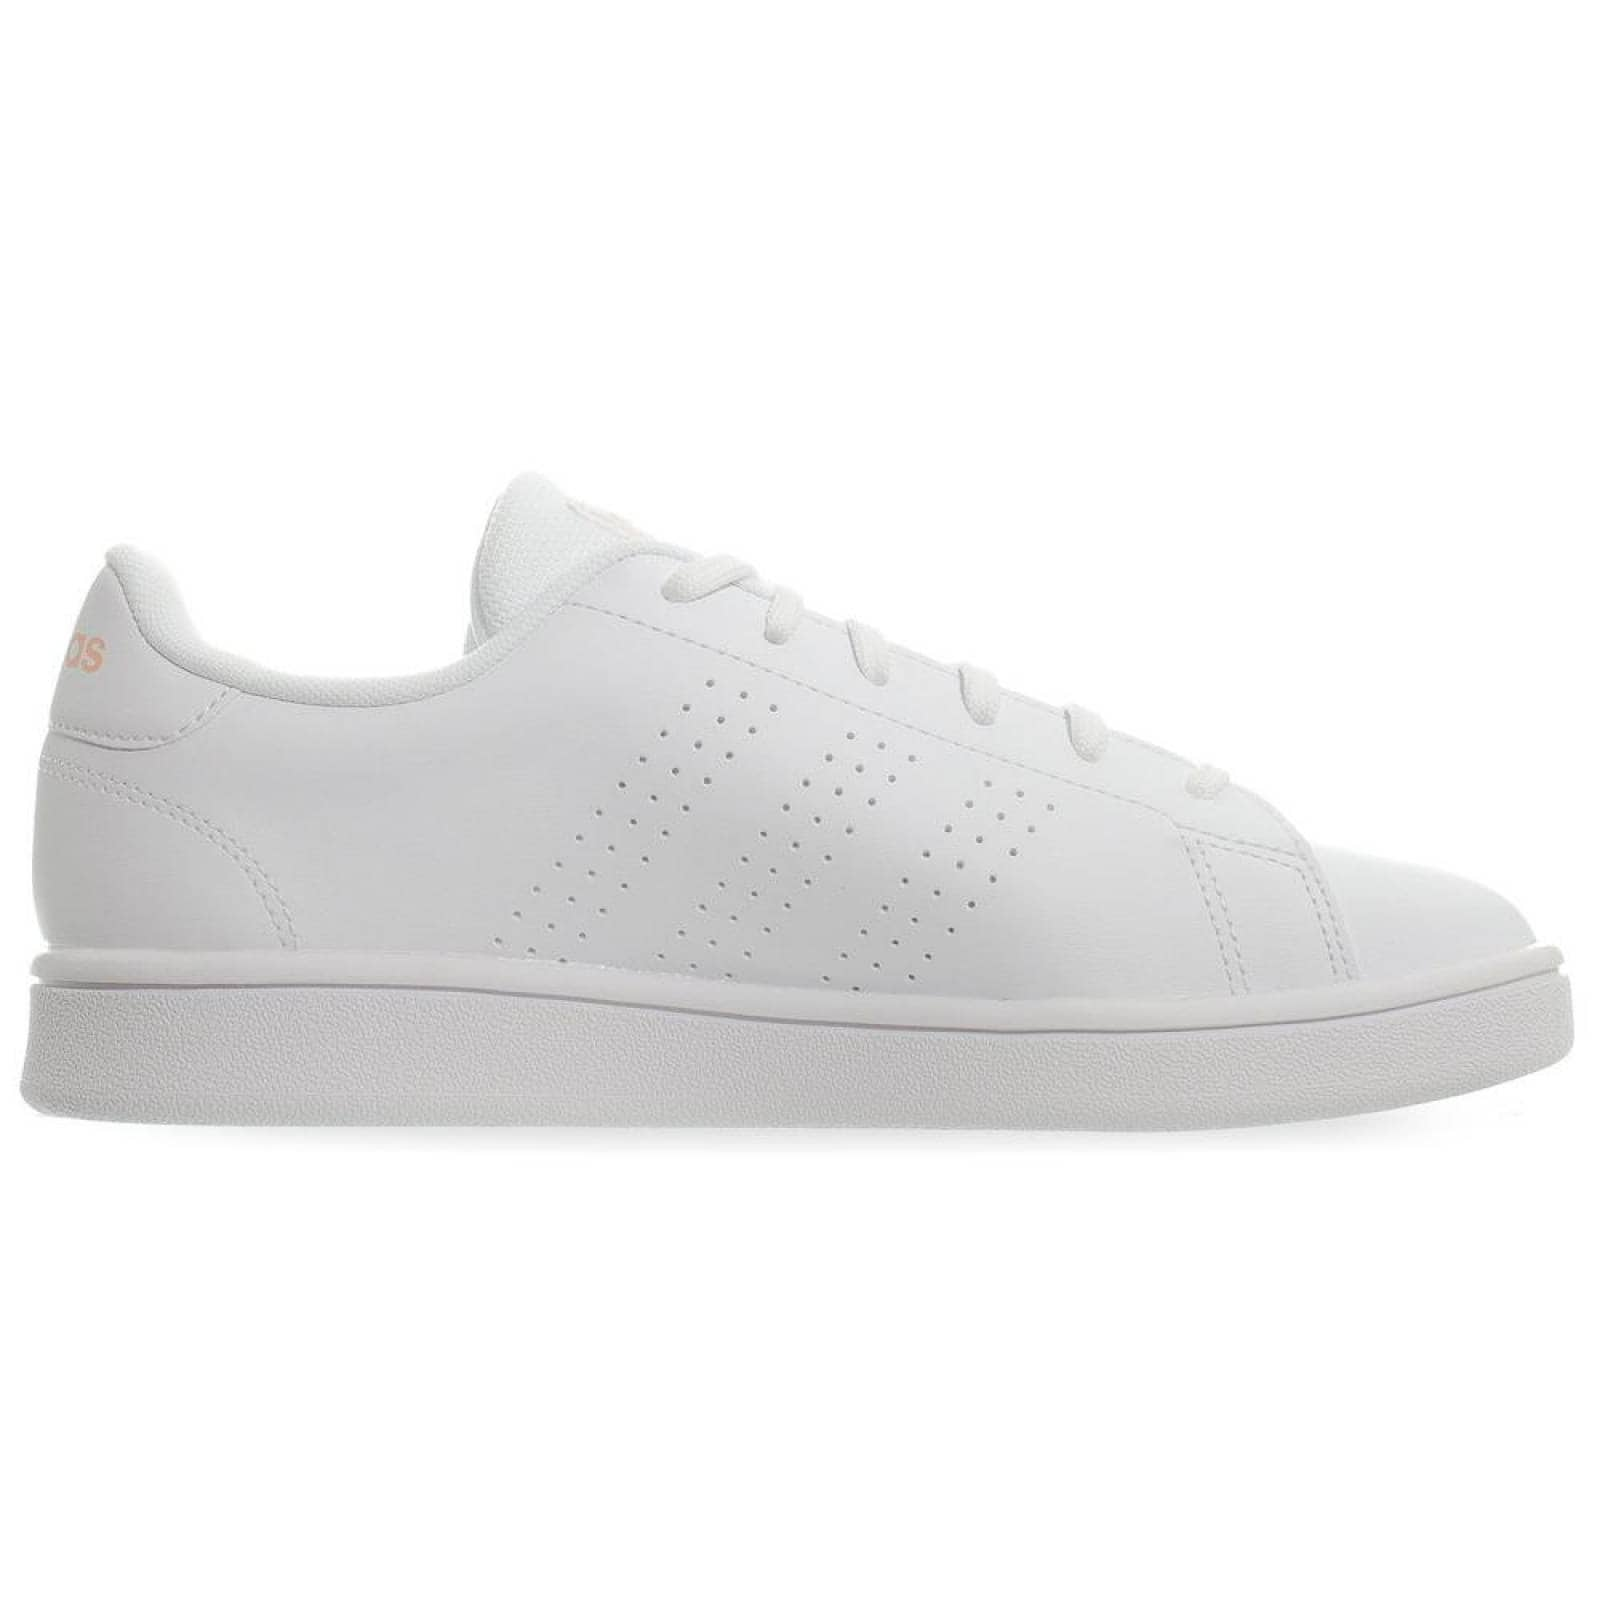 Tenis Adidas Advantage Base - EE7510 - Blanco - Mujer